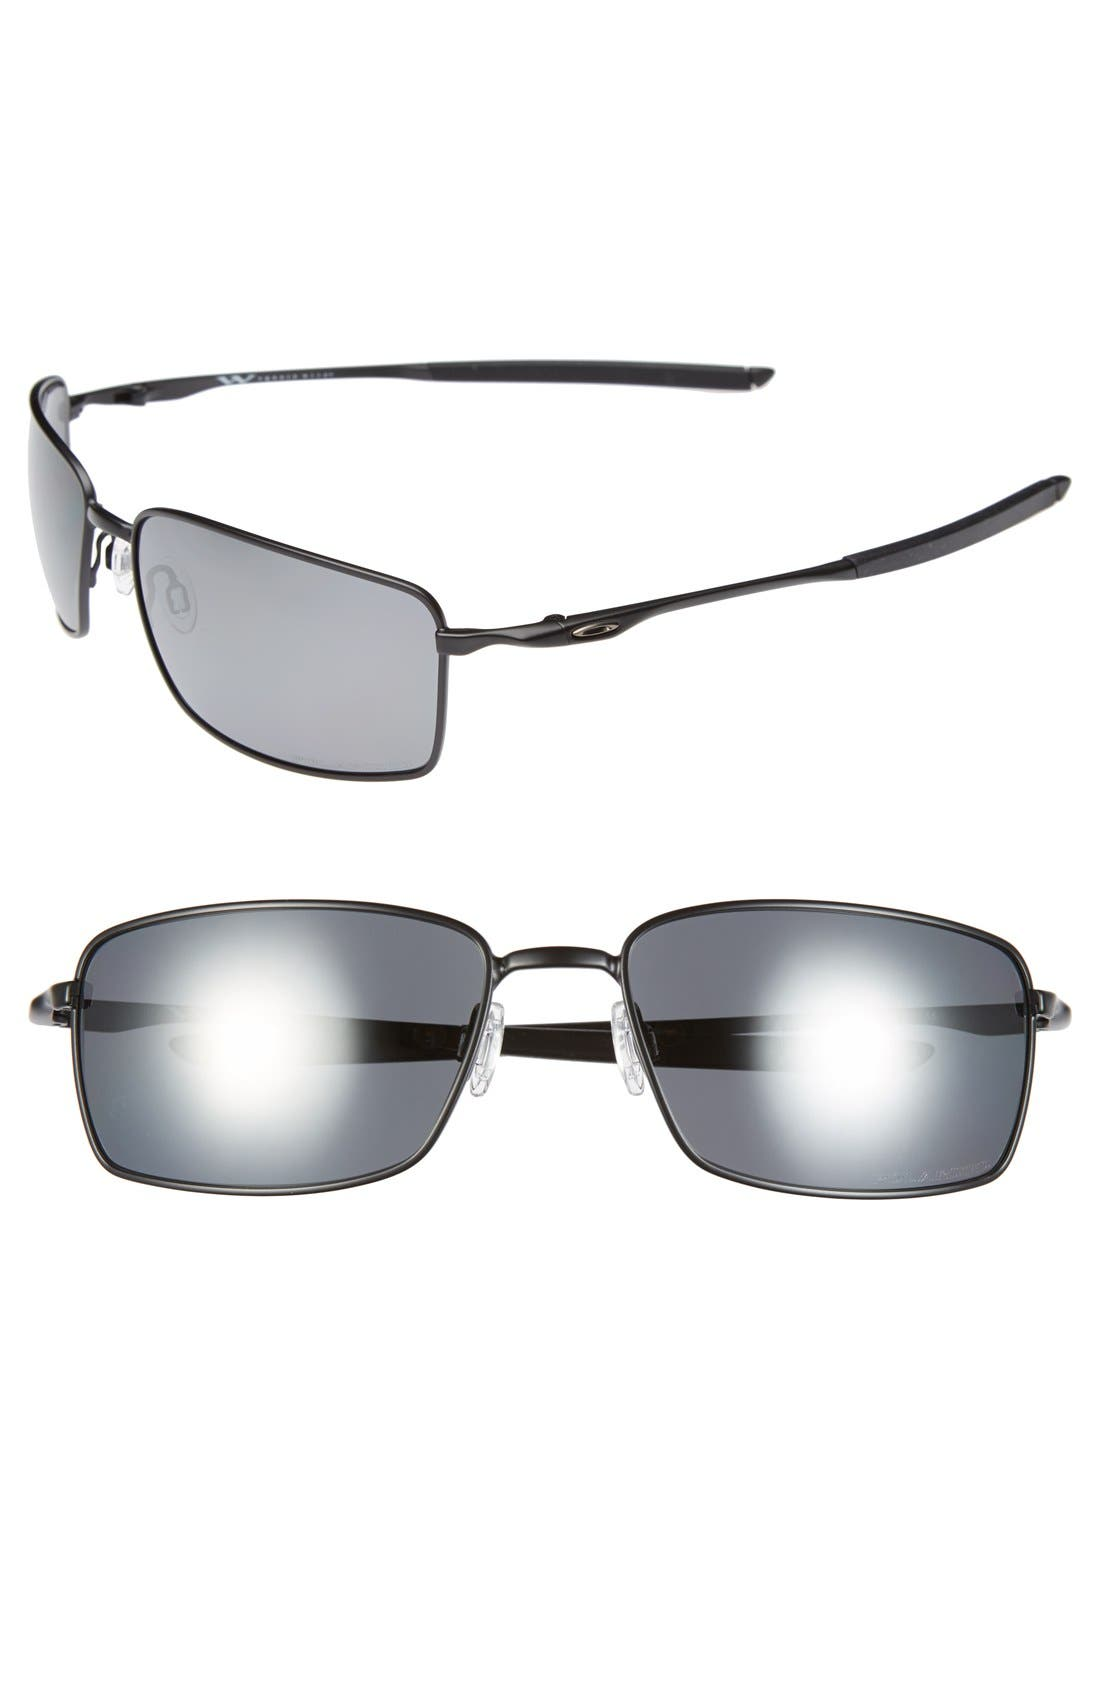 60mm Polarized Sunglasses,                         Main,                         color, Matte Black